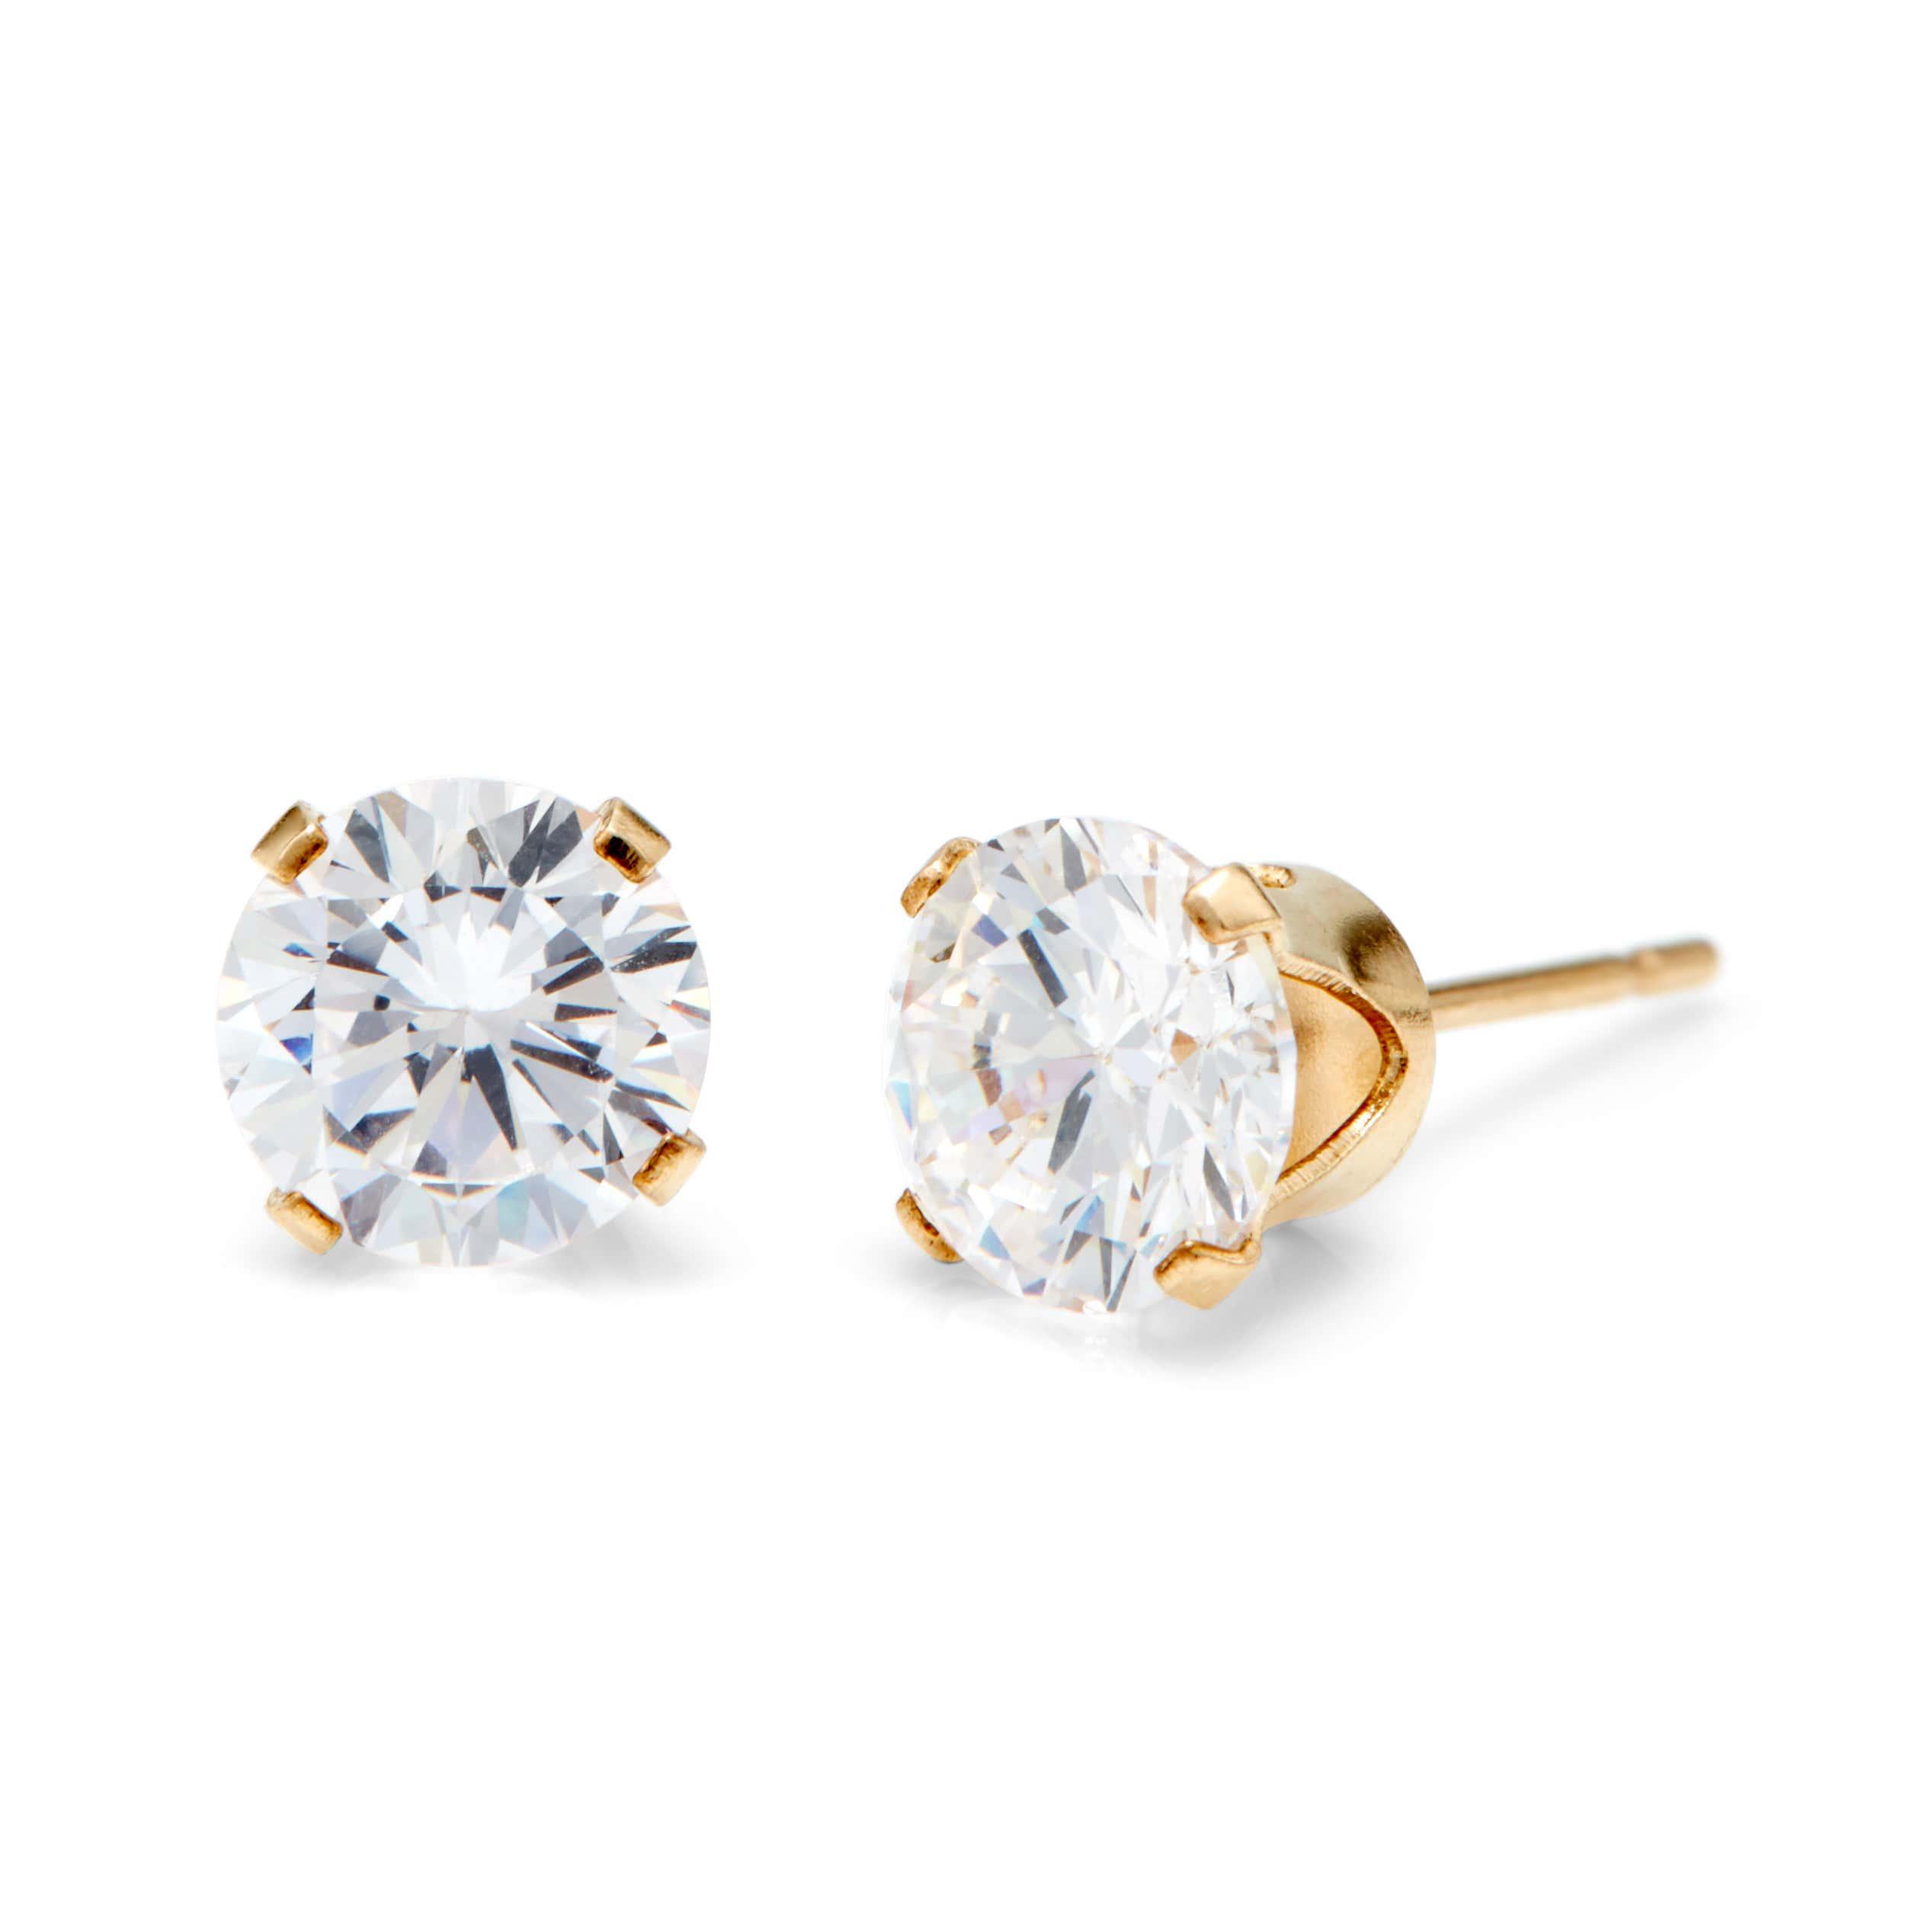 Men S 14k Gold Filled Round Diamond Cz 6mm Stud Earrings